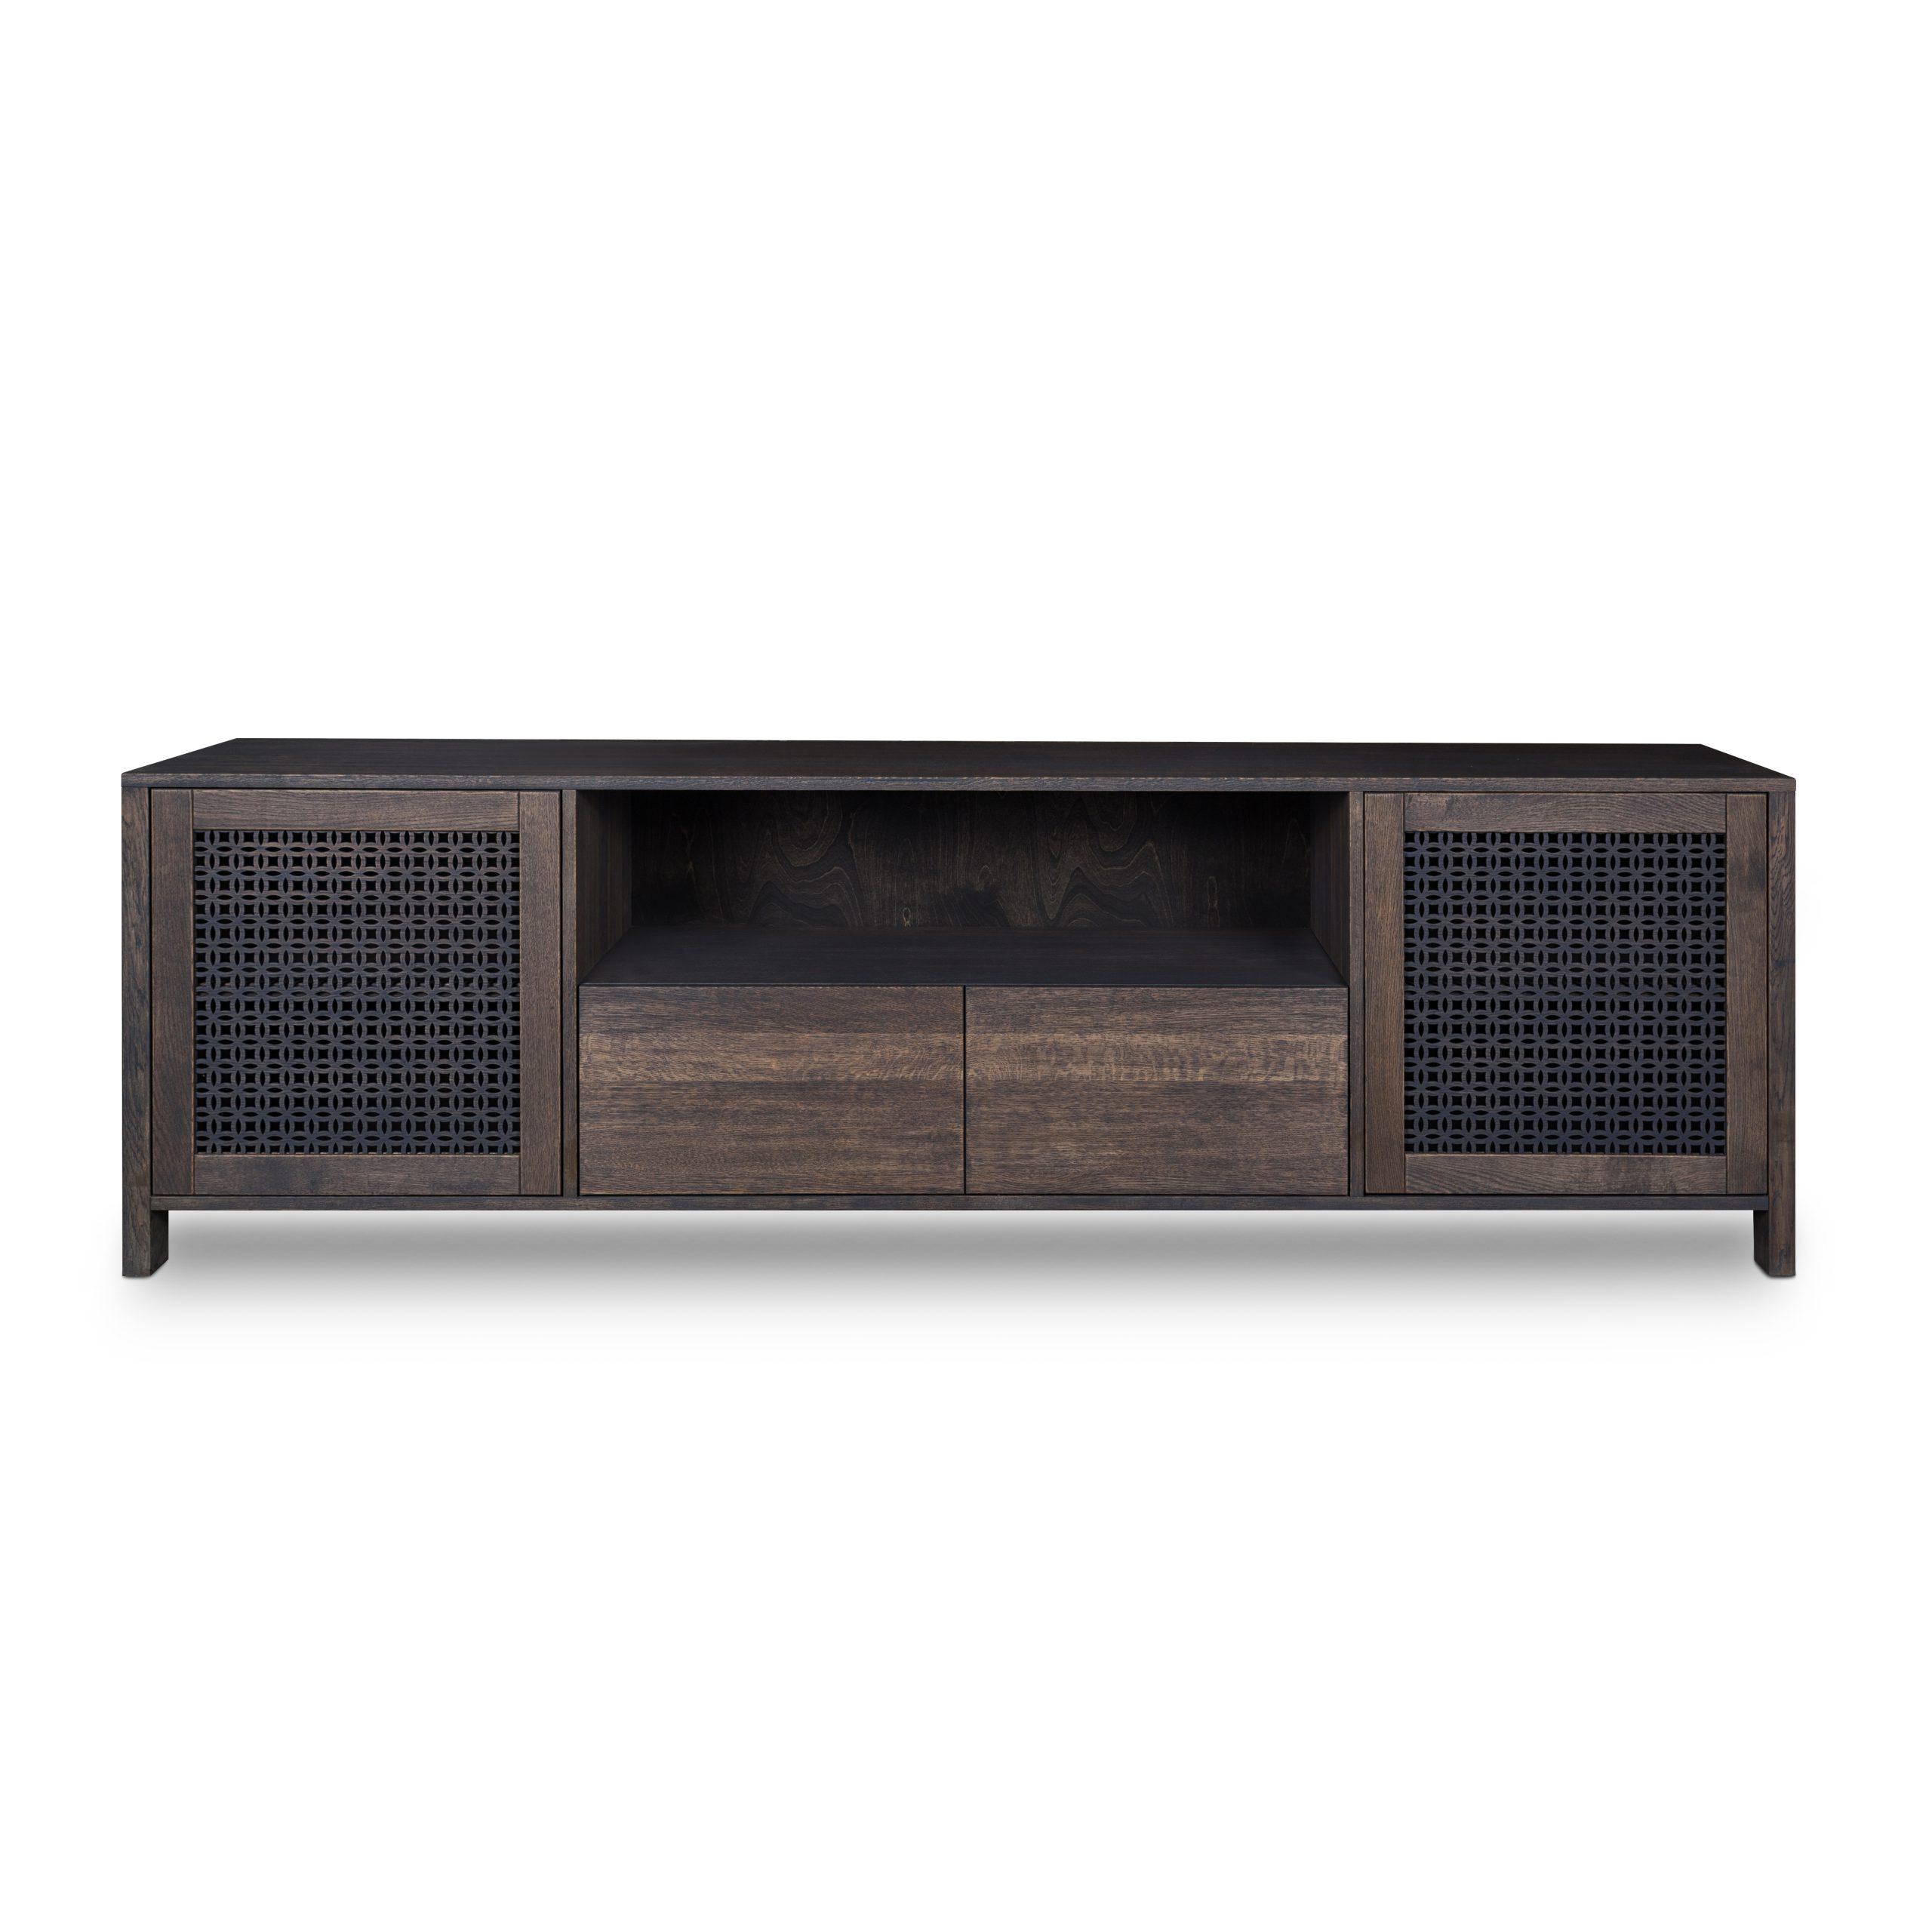 Juga-furniture-baldu-gamyba-vilniuje-tv-spintele-TOMI-produktas-3